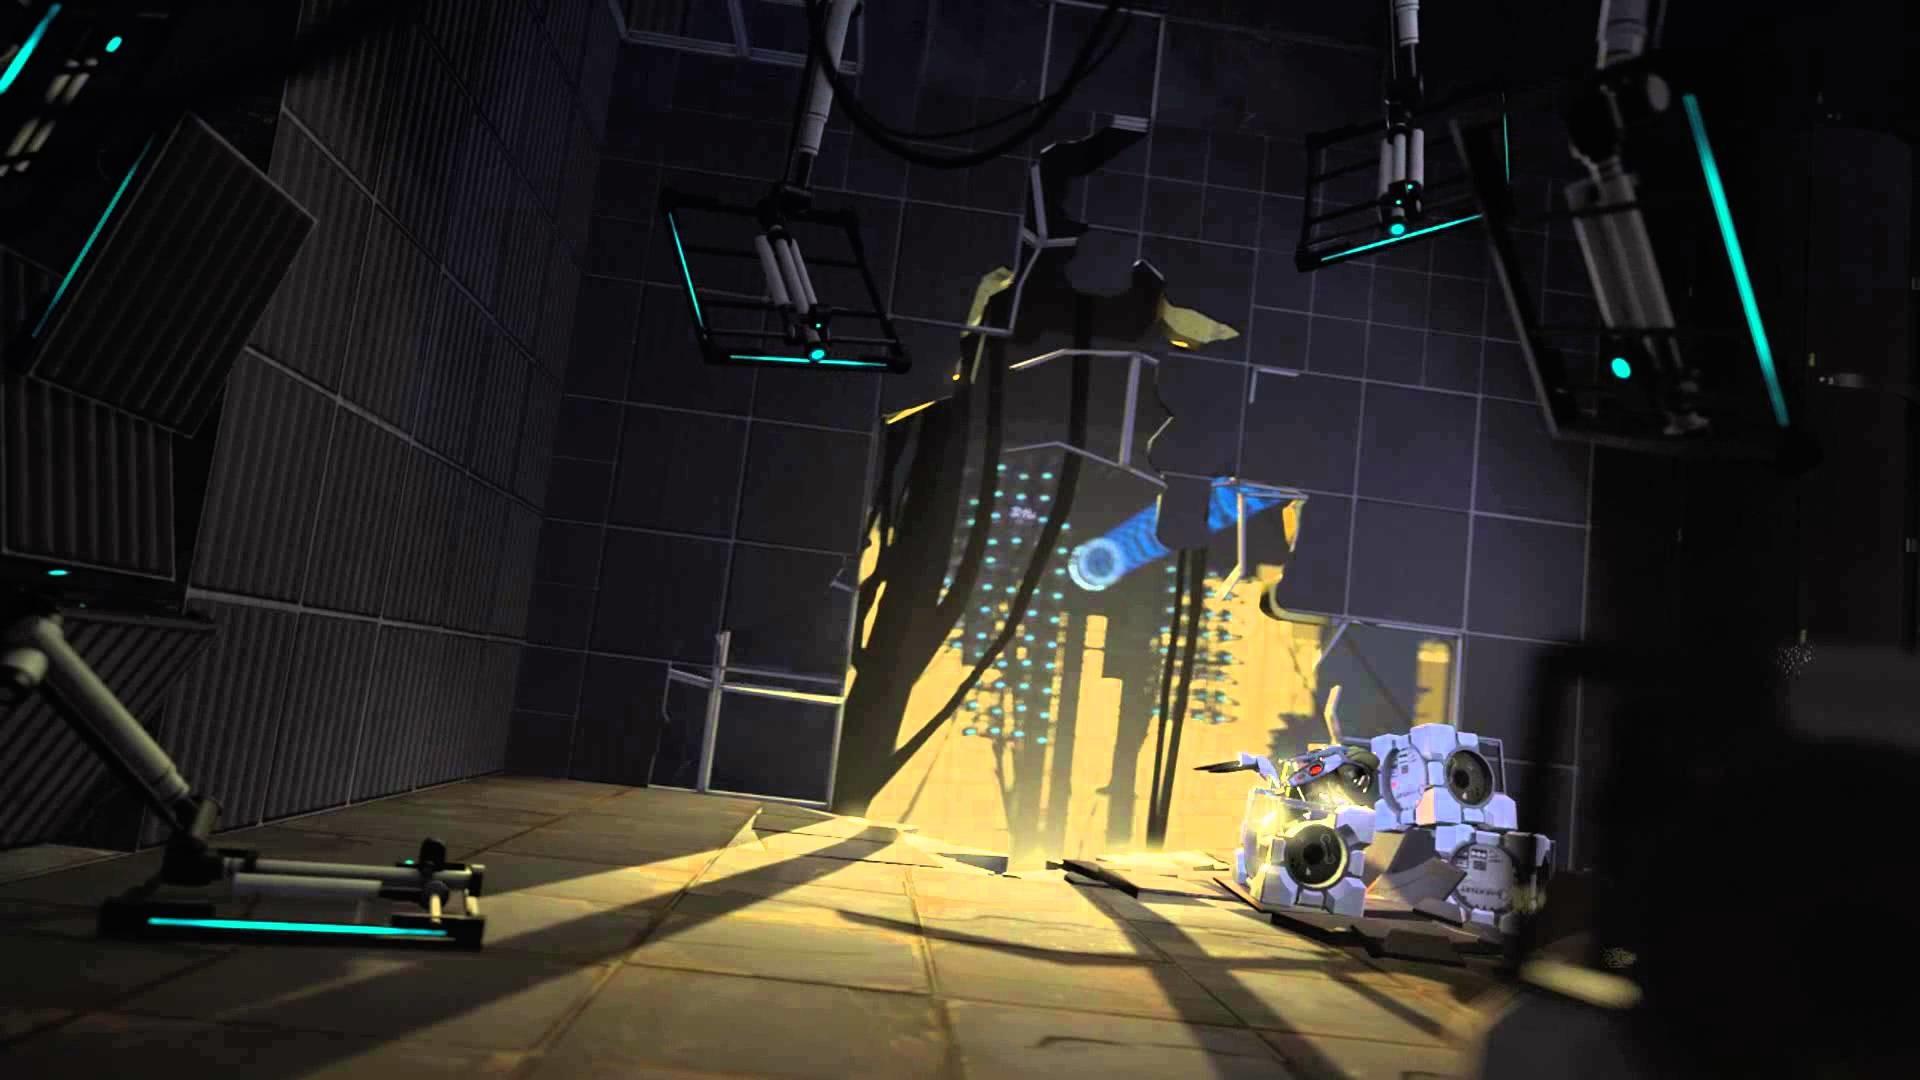 Portal 2 Background (84+ images)